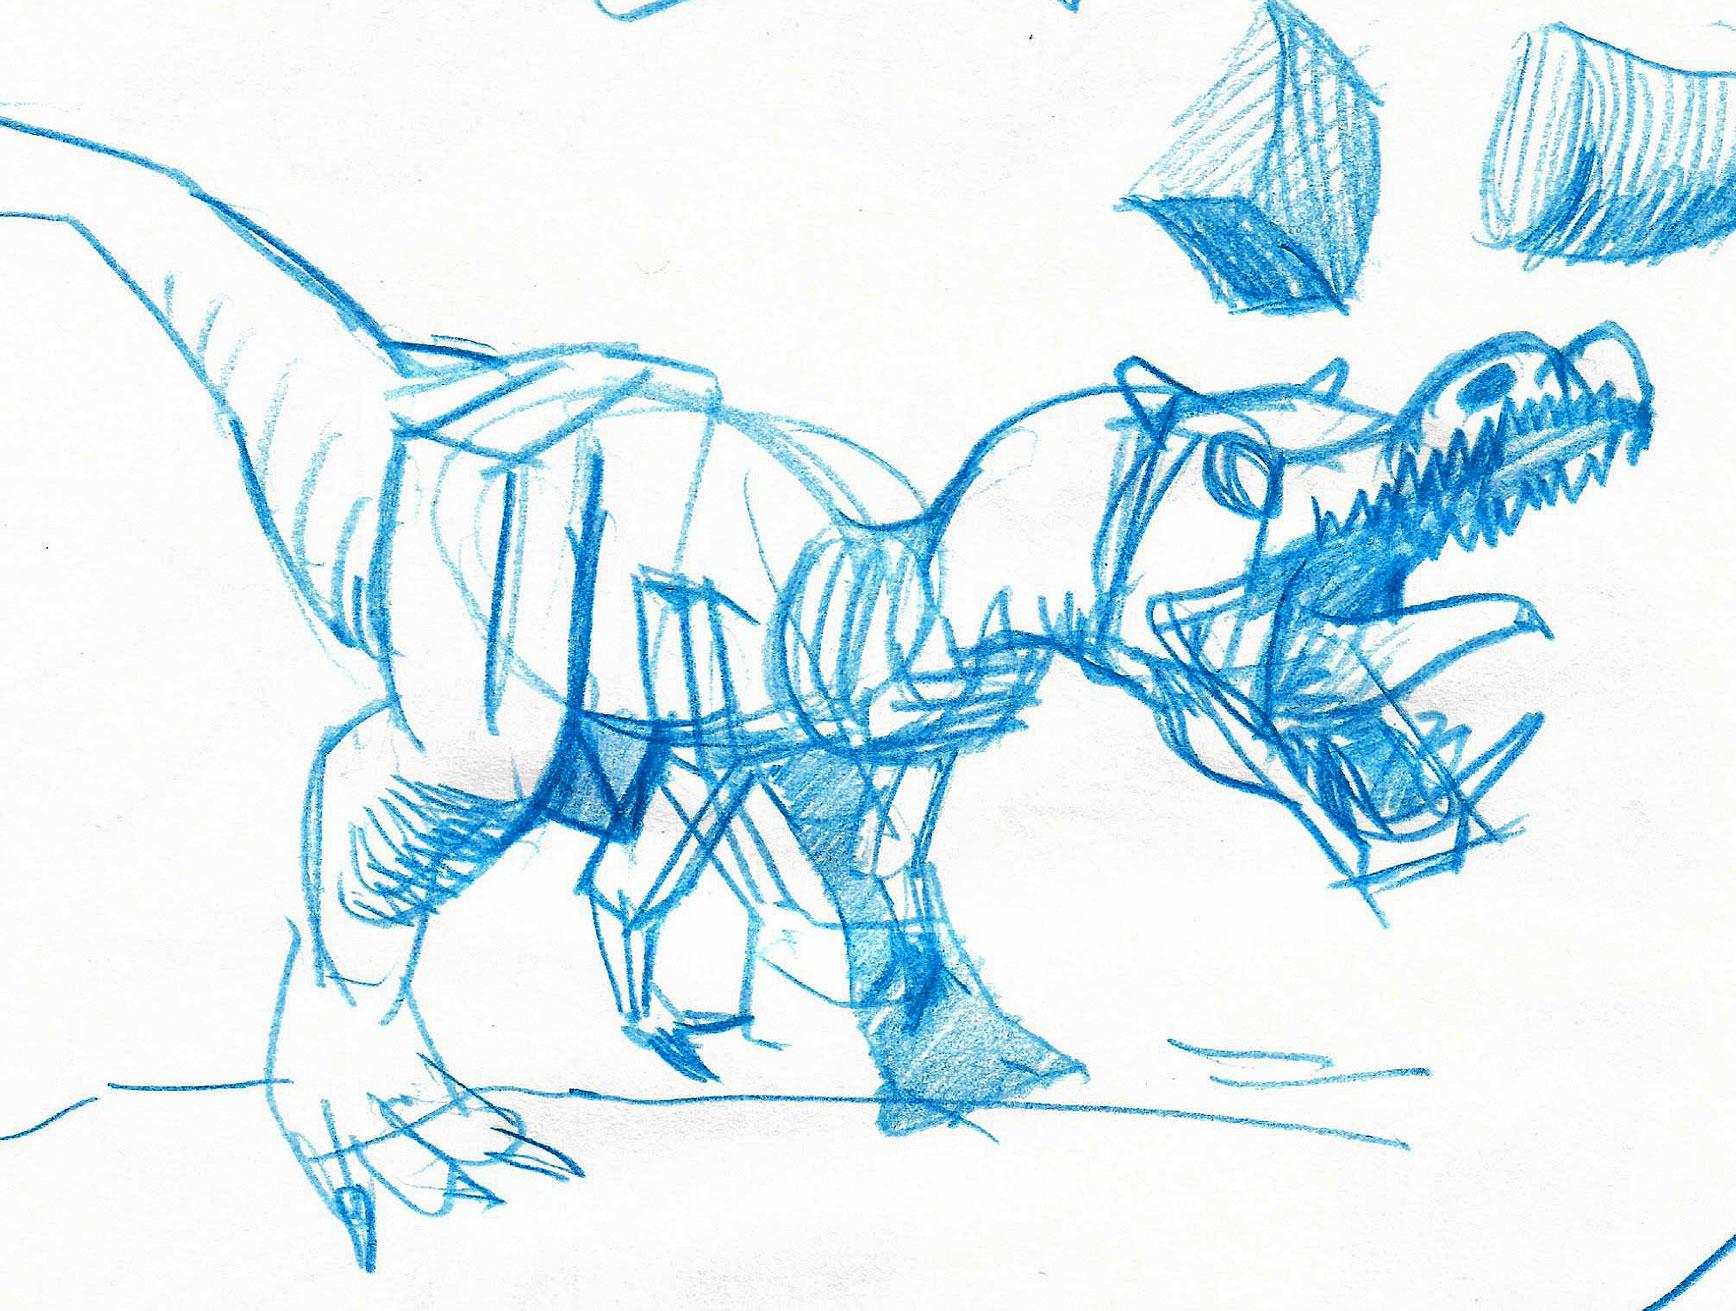 Dinozaver, september 2020